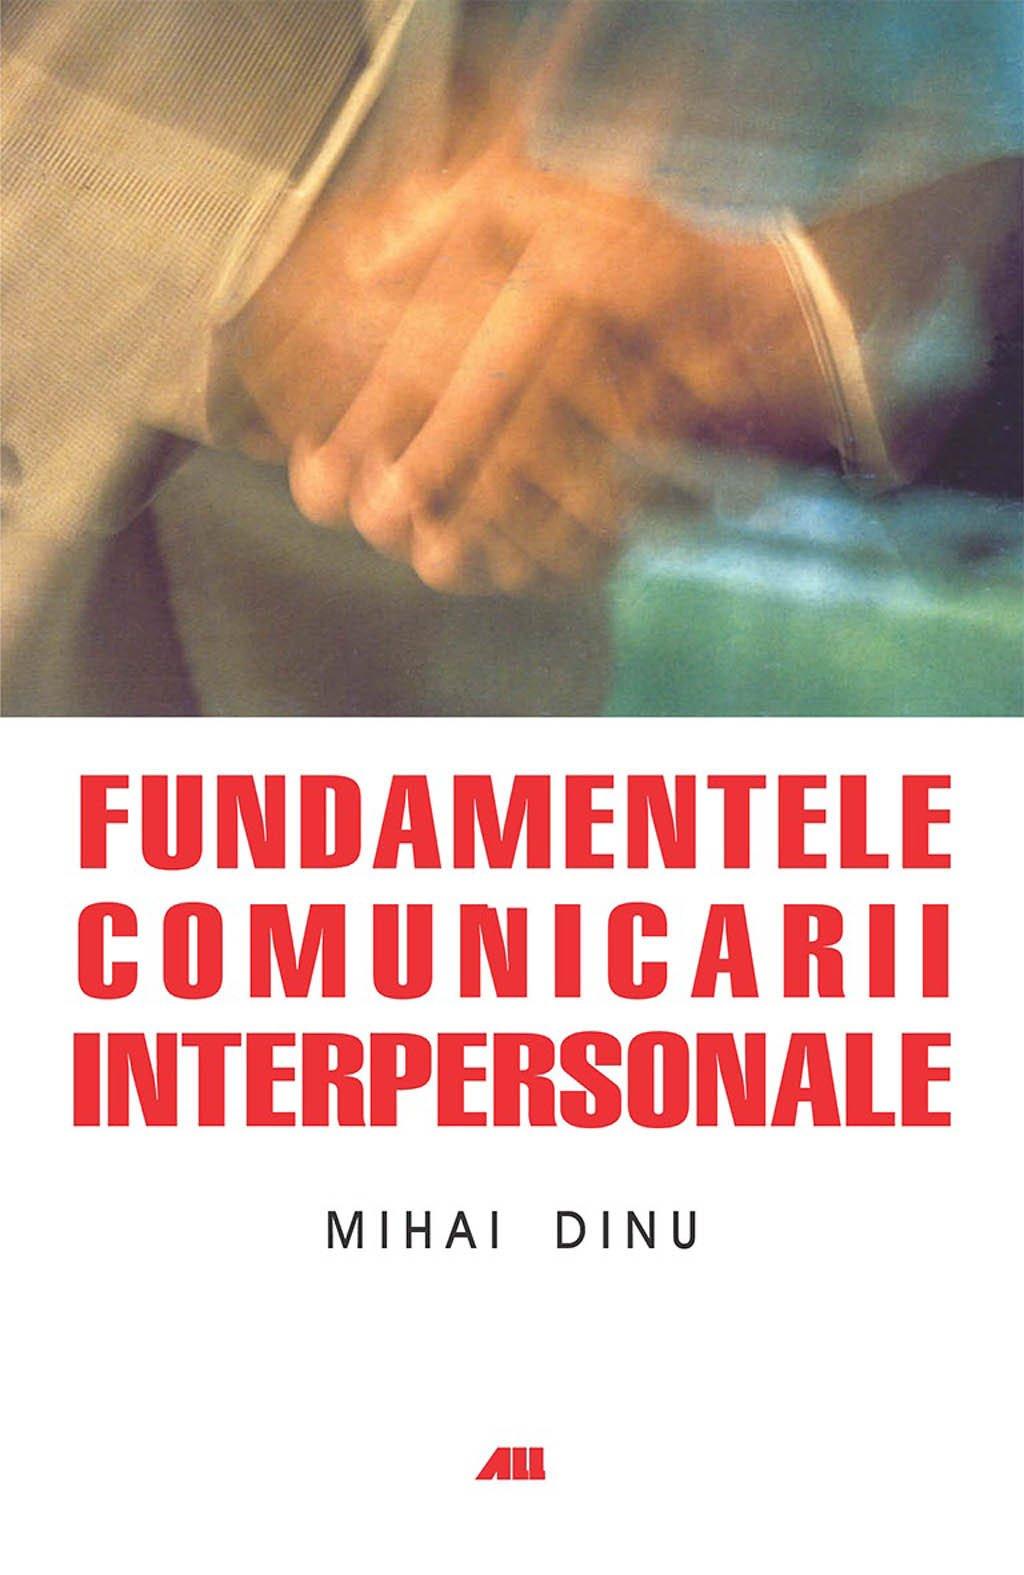 book narratology and interpretation the content